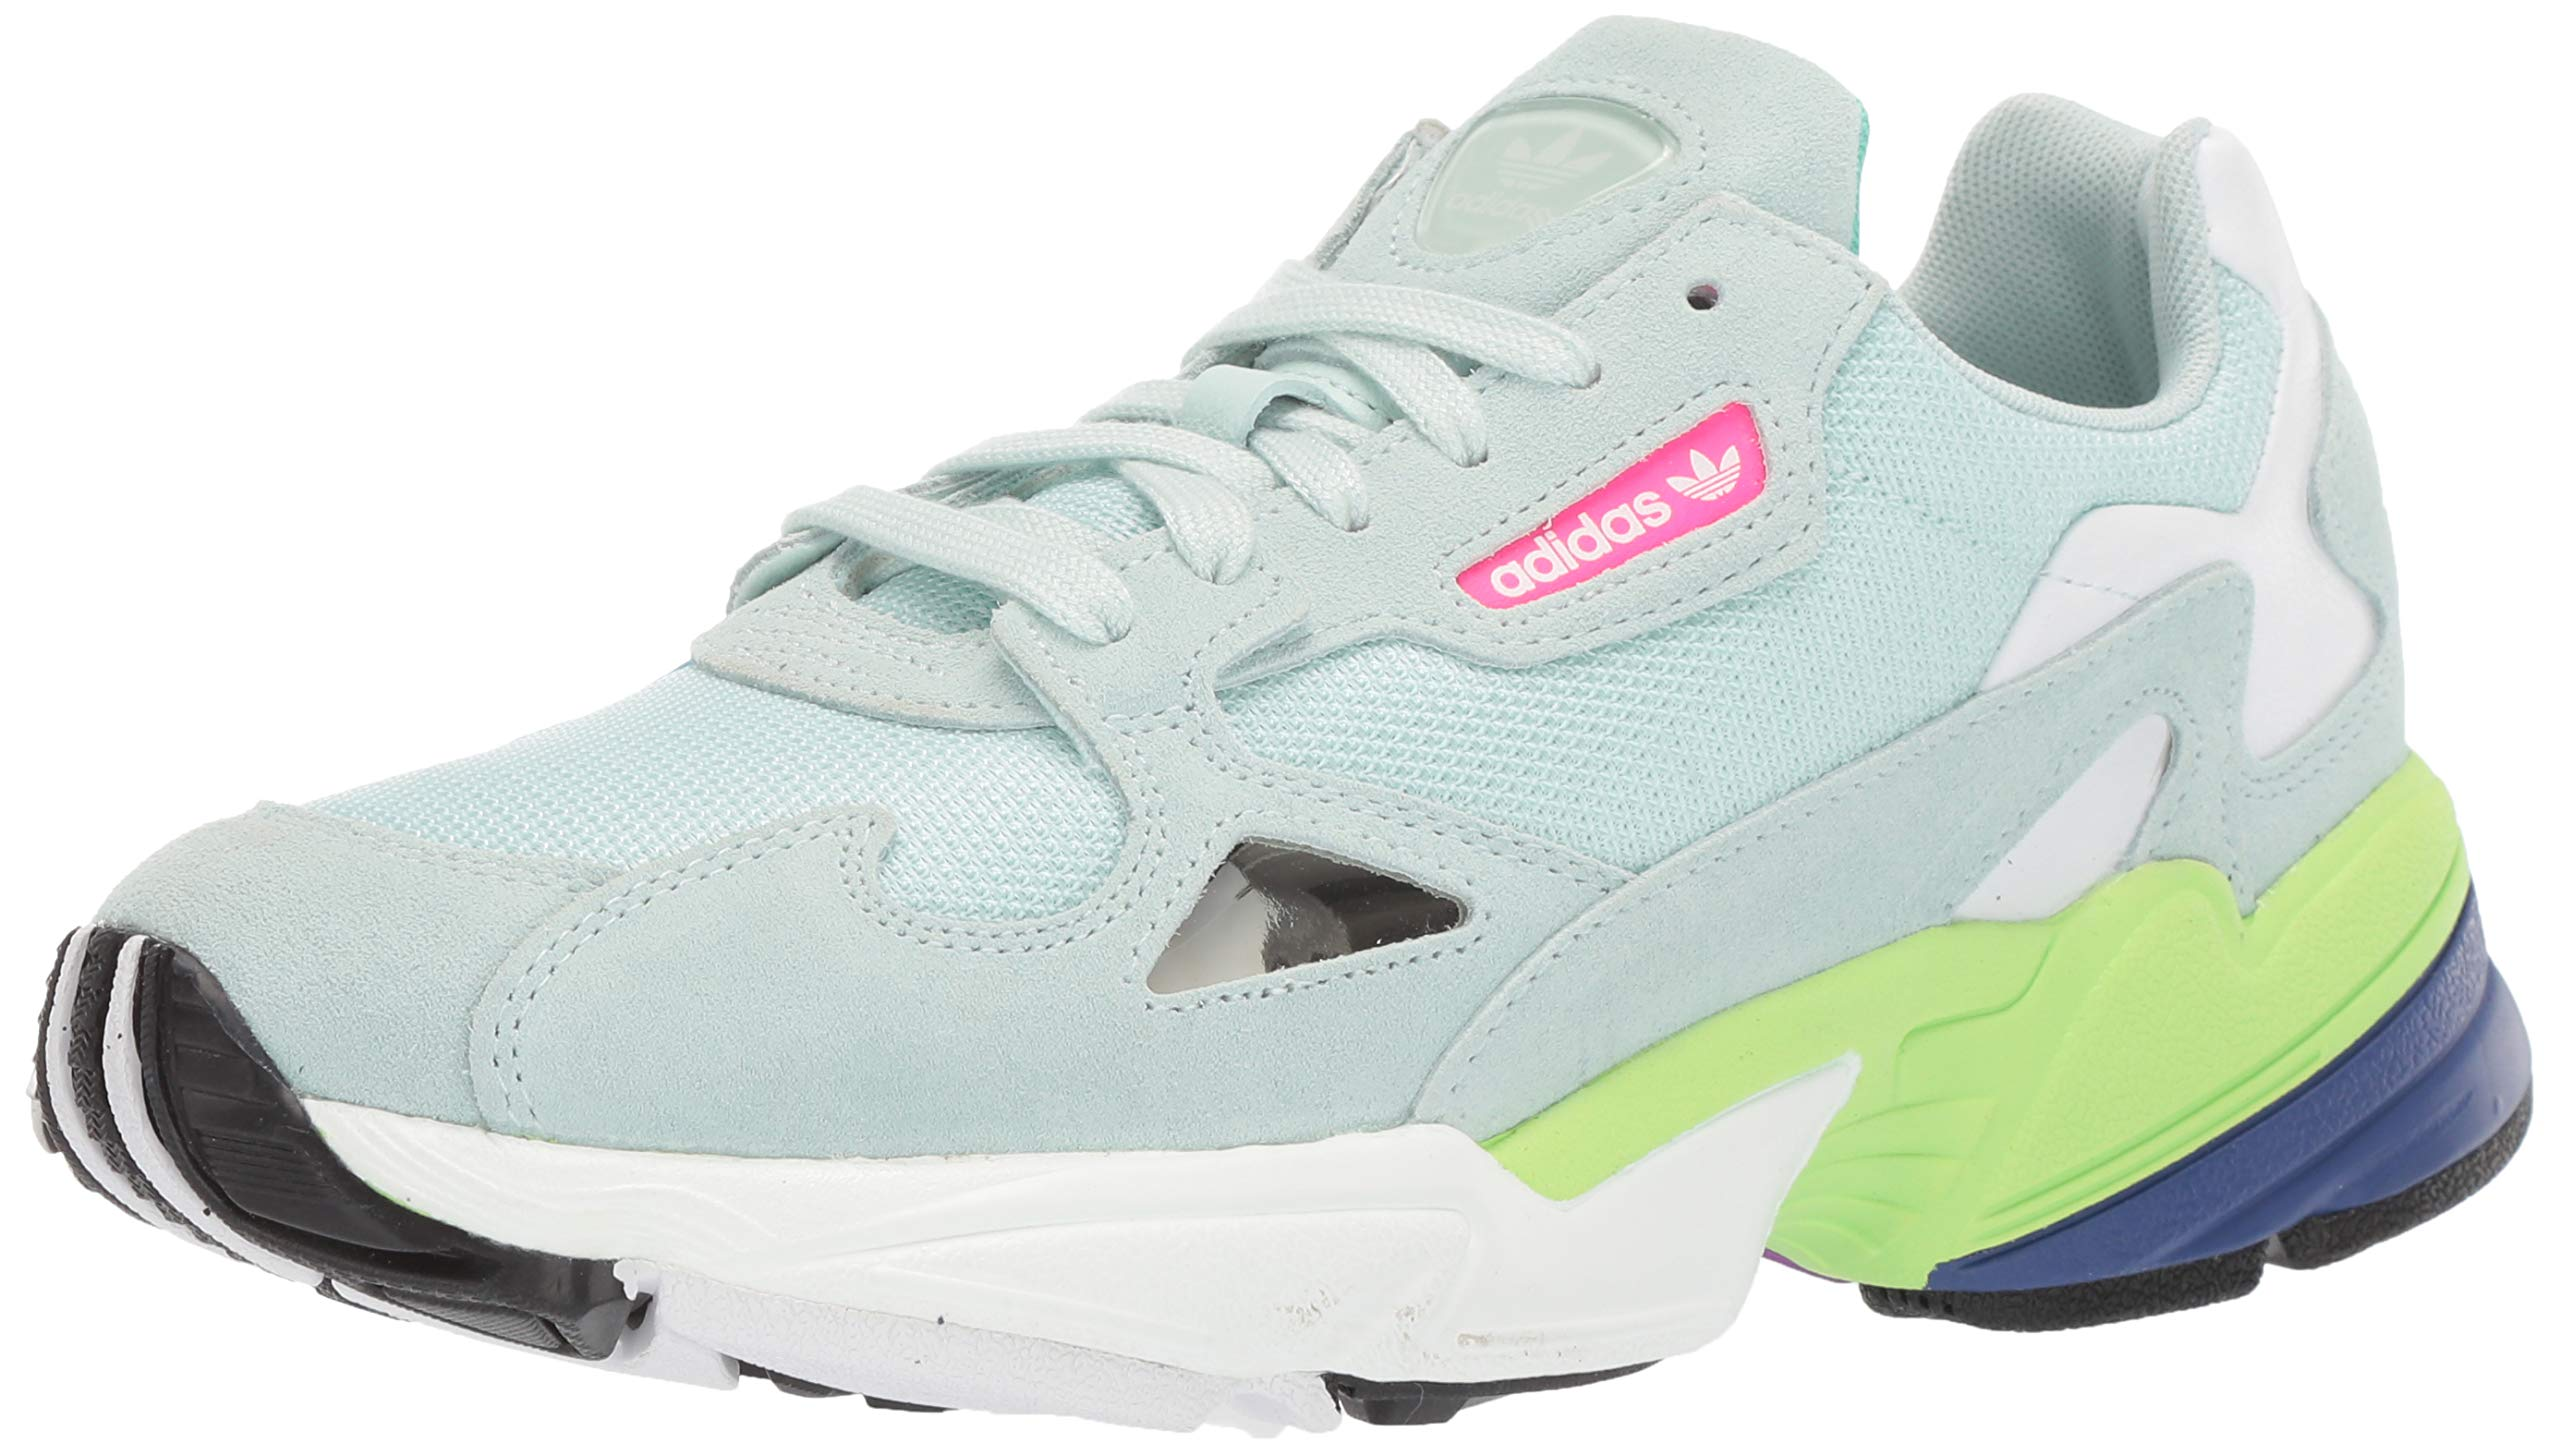 aea5216d Galleon - Adidas Originals Women's Falcon Running Shoe Ice Mint/Black, 9 M  US